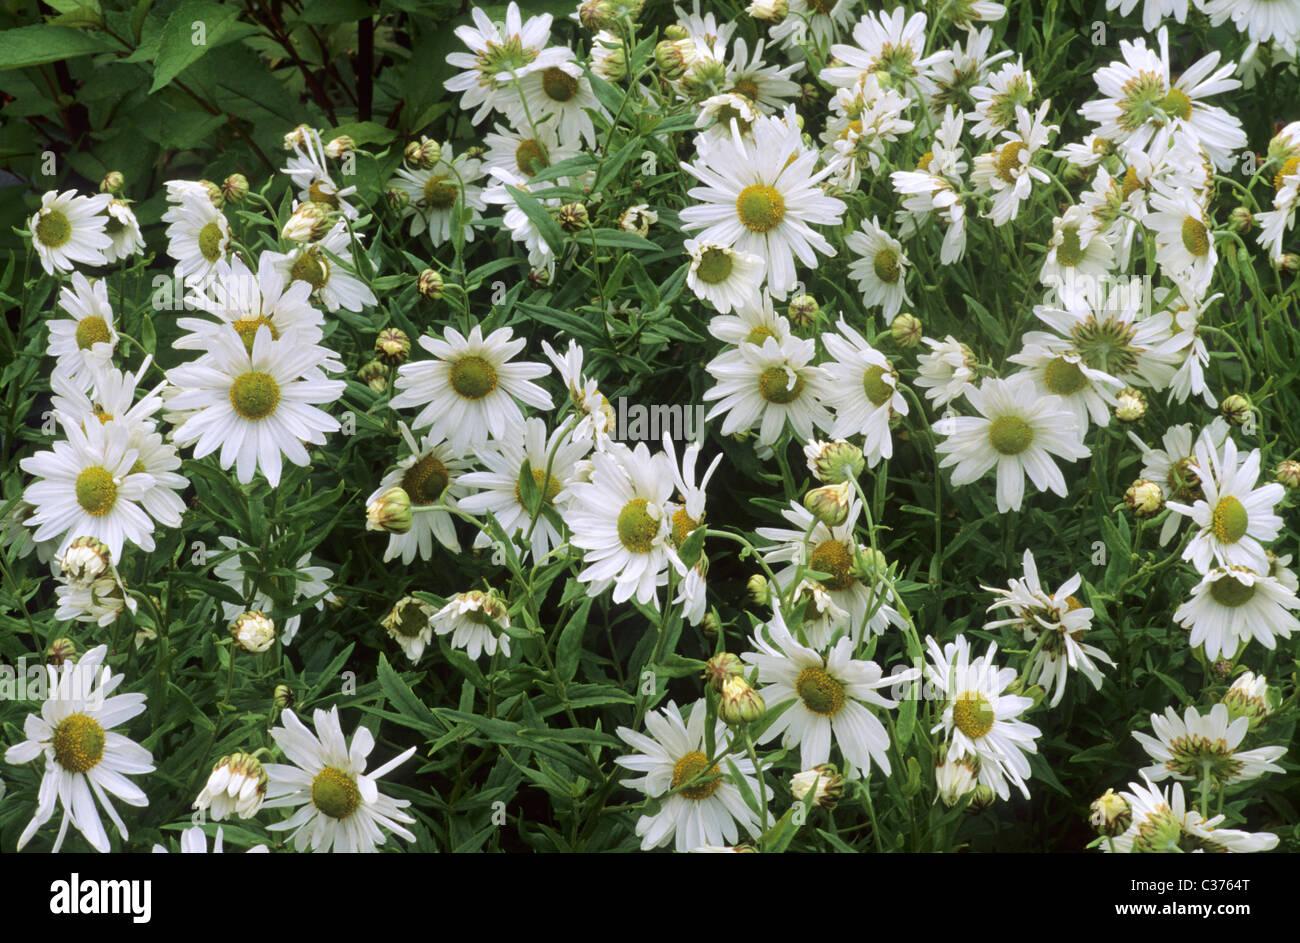 Leucanthemella serotina chrysanthemum uliginosum white flower stock leucanthemella serotina chrysanthemum uliginosum white flower flowers green centre centres garden plant plants mightylinksfo